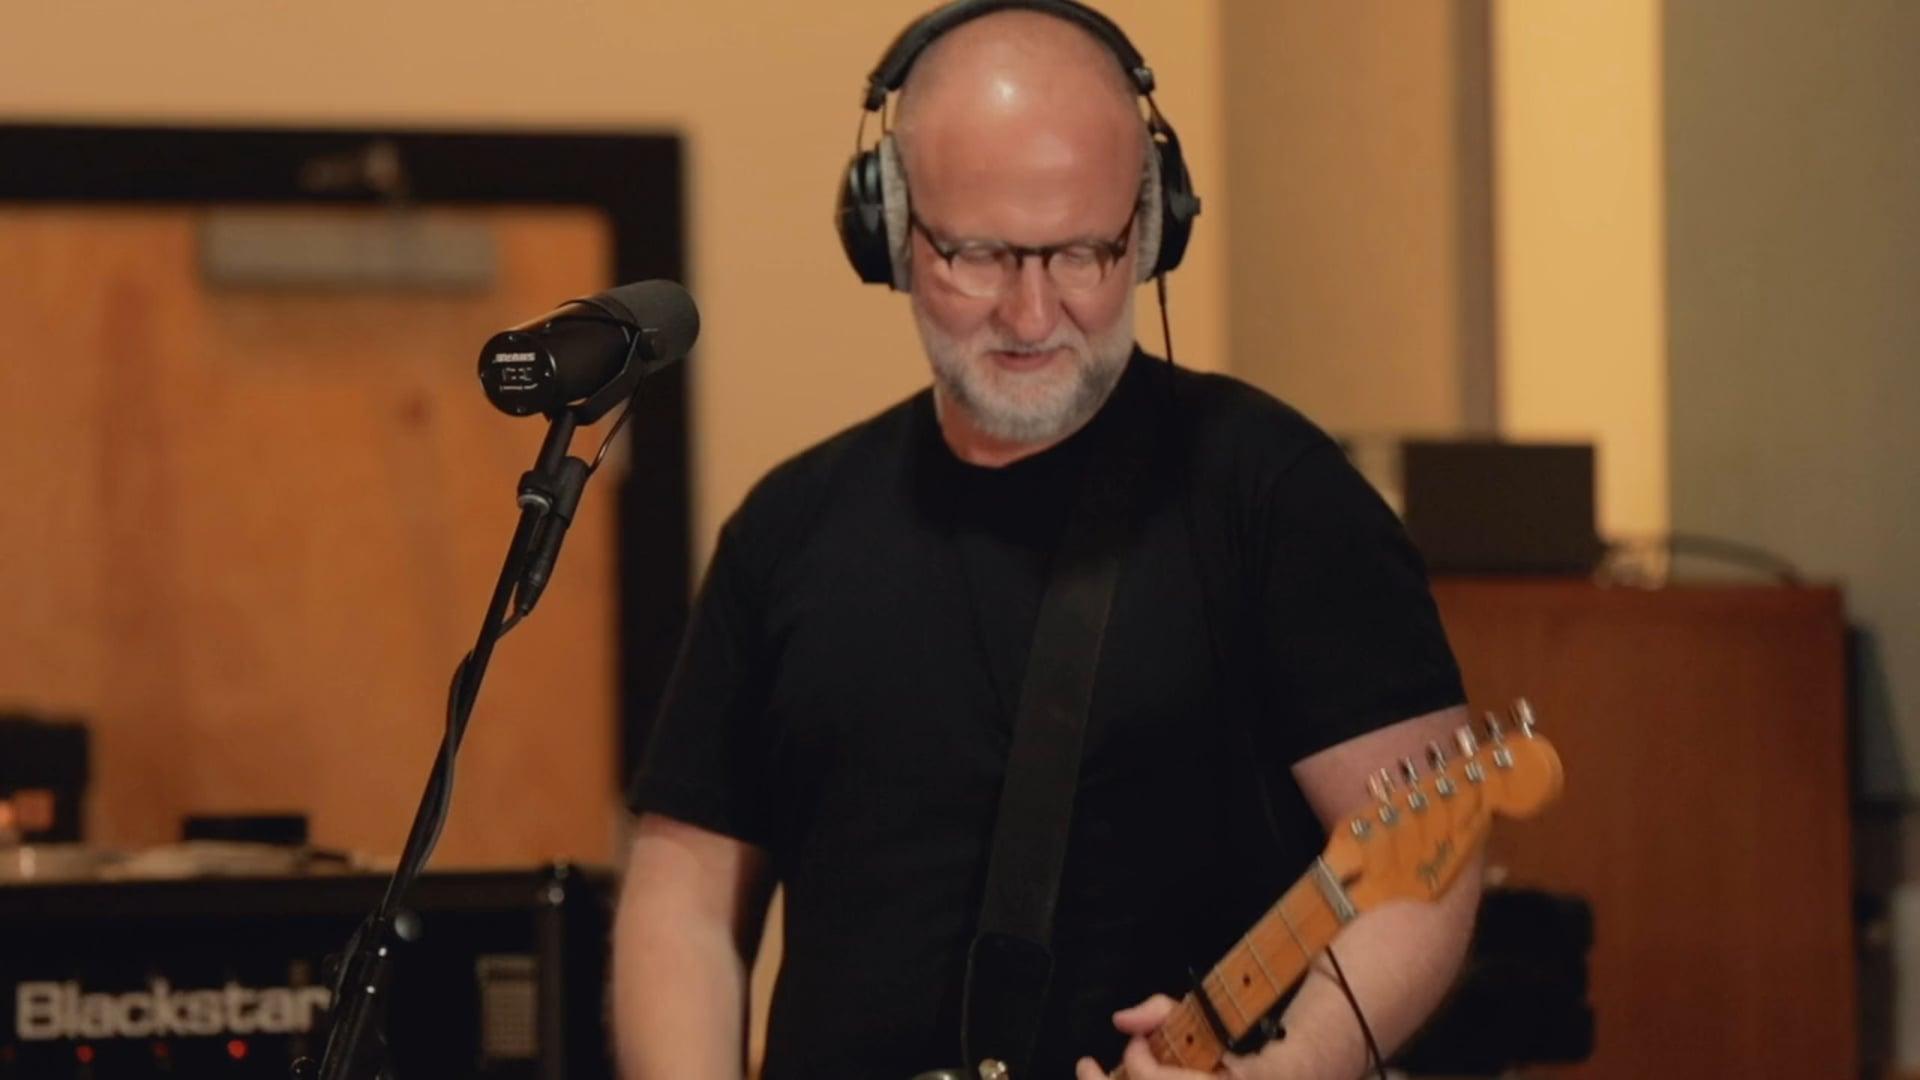 Bob Mould: Sunshine Rock Studio Session Mini-Documentary